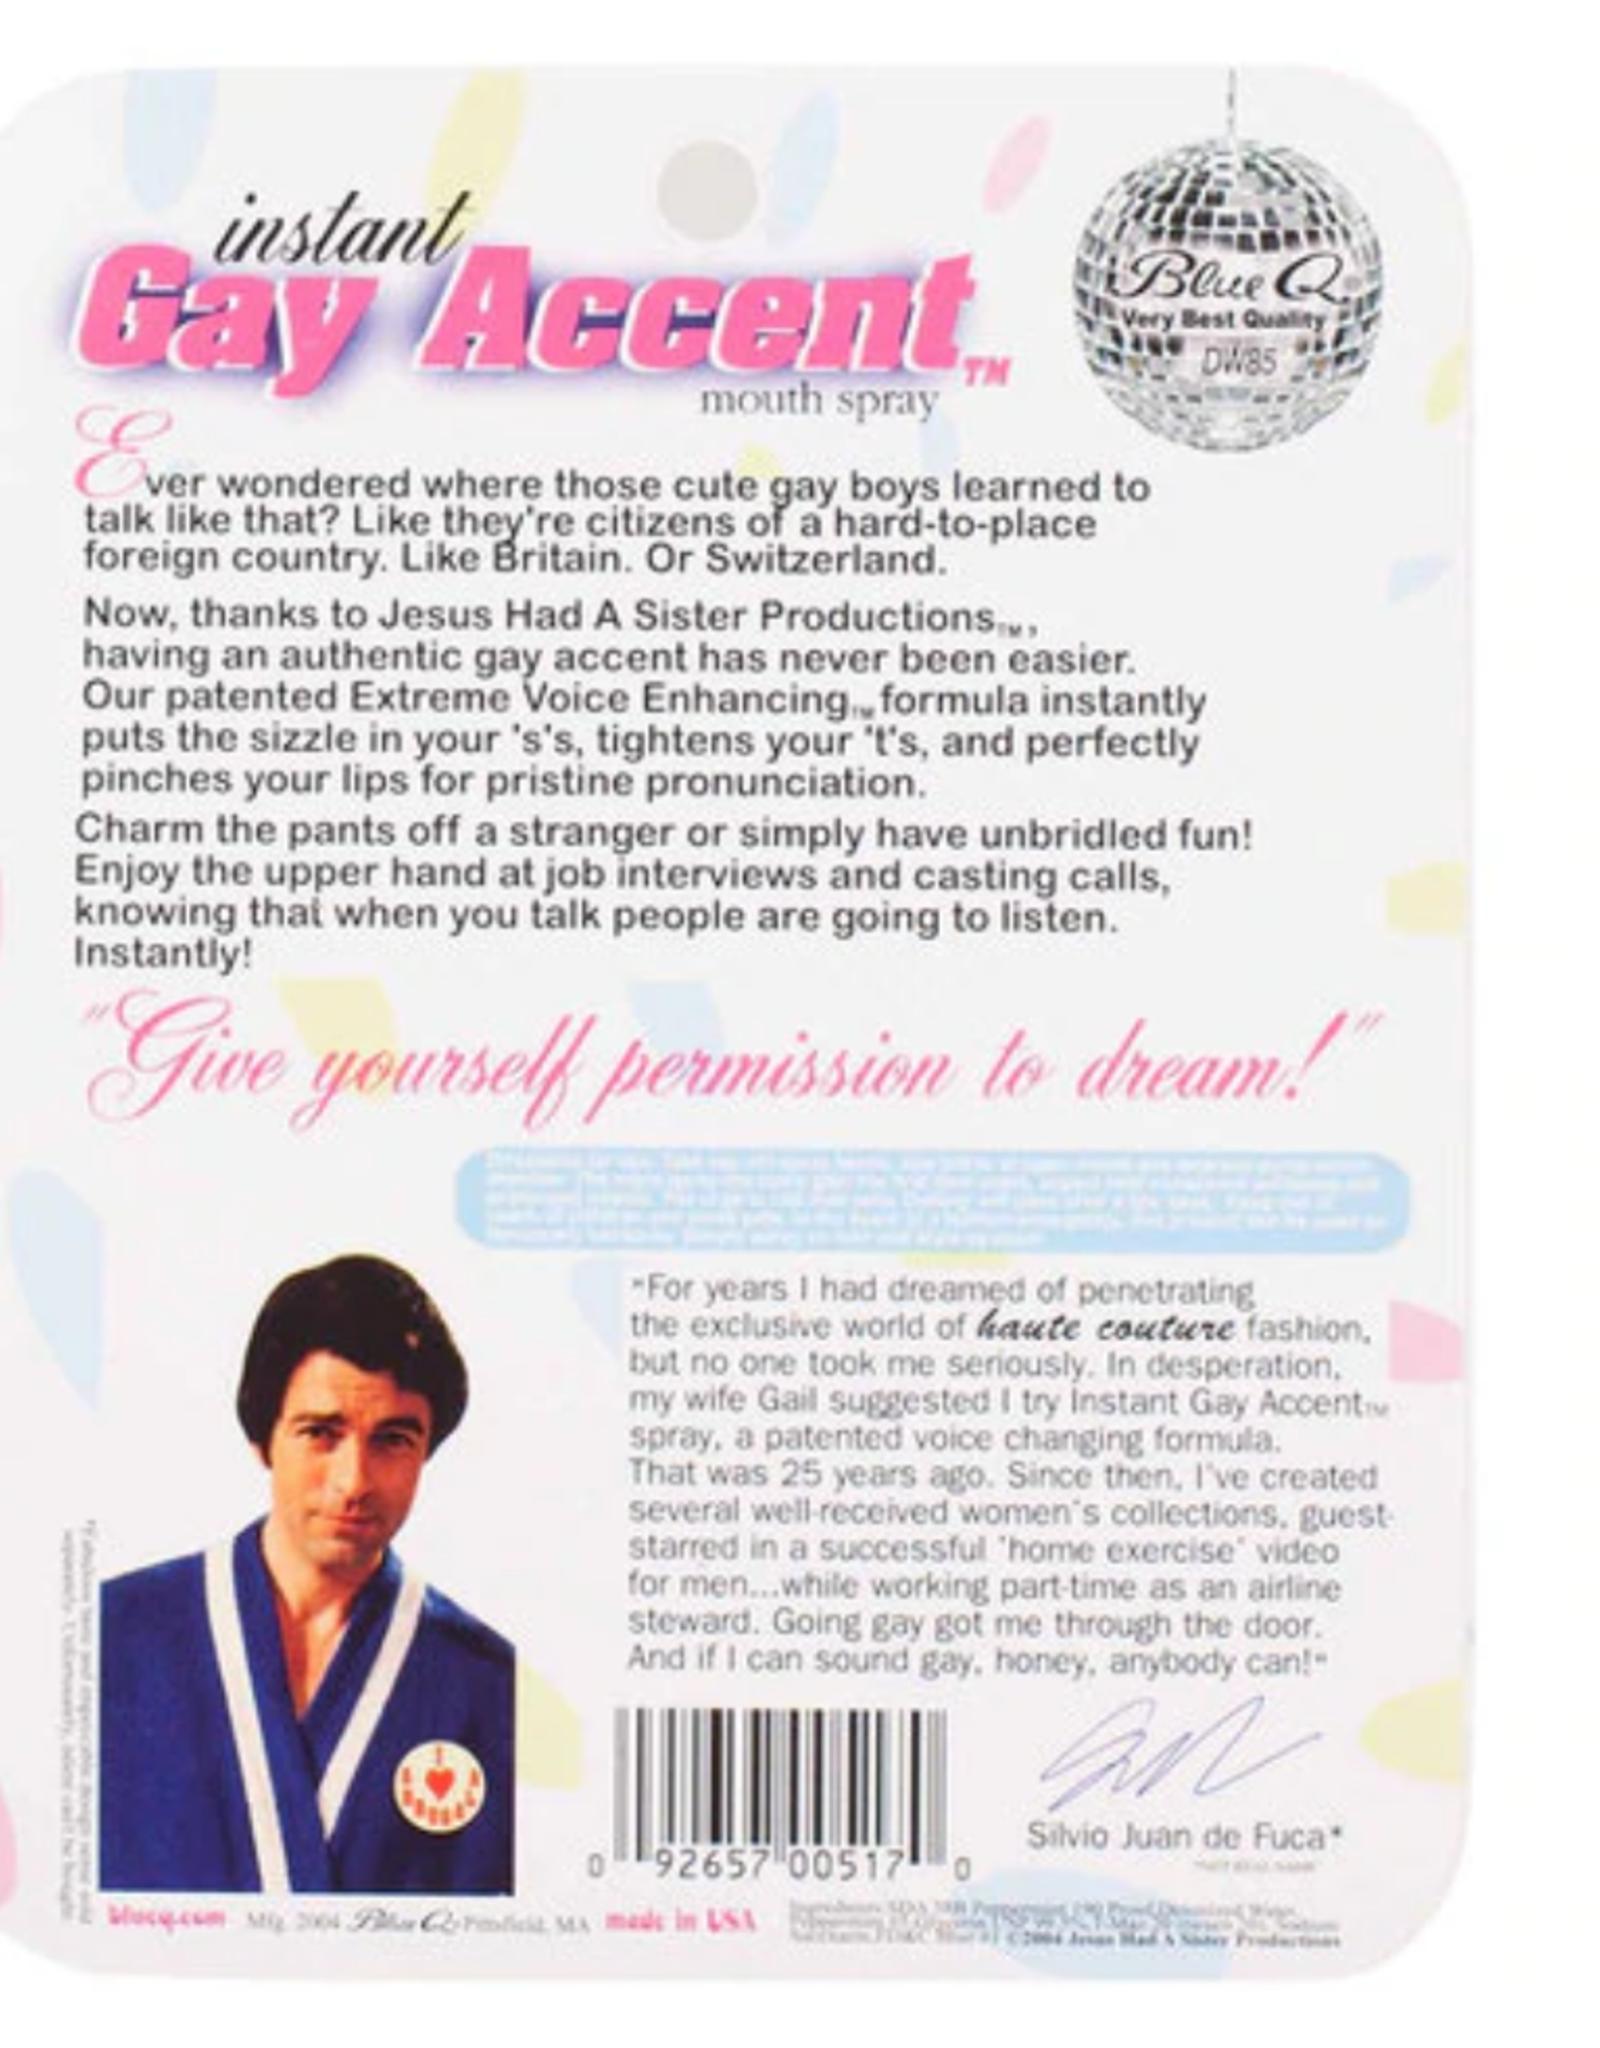 Instant Gay Accent Breath Spray